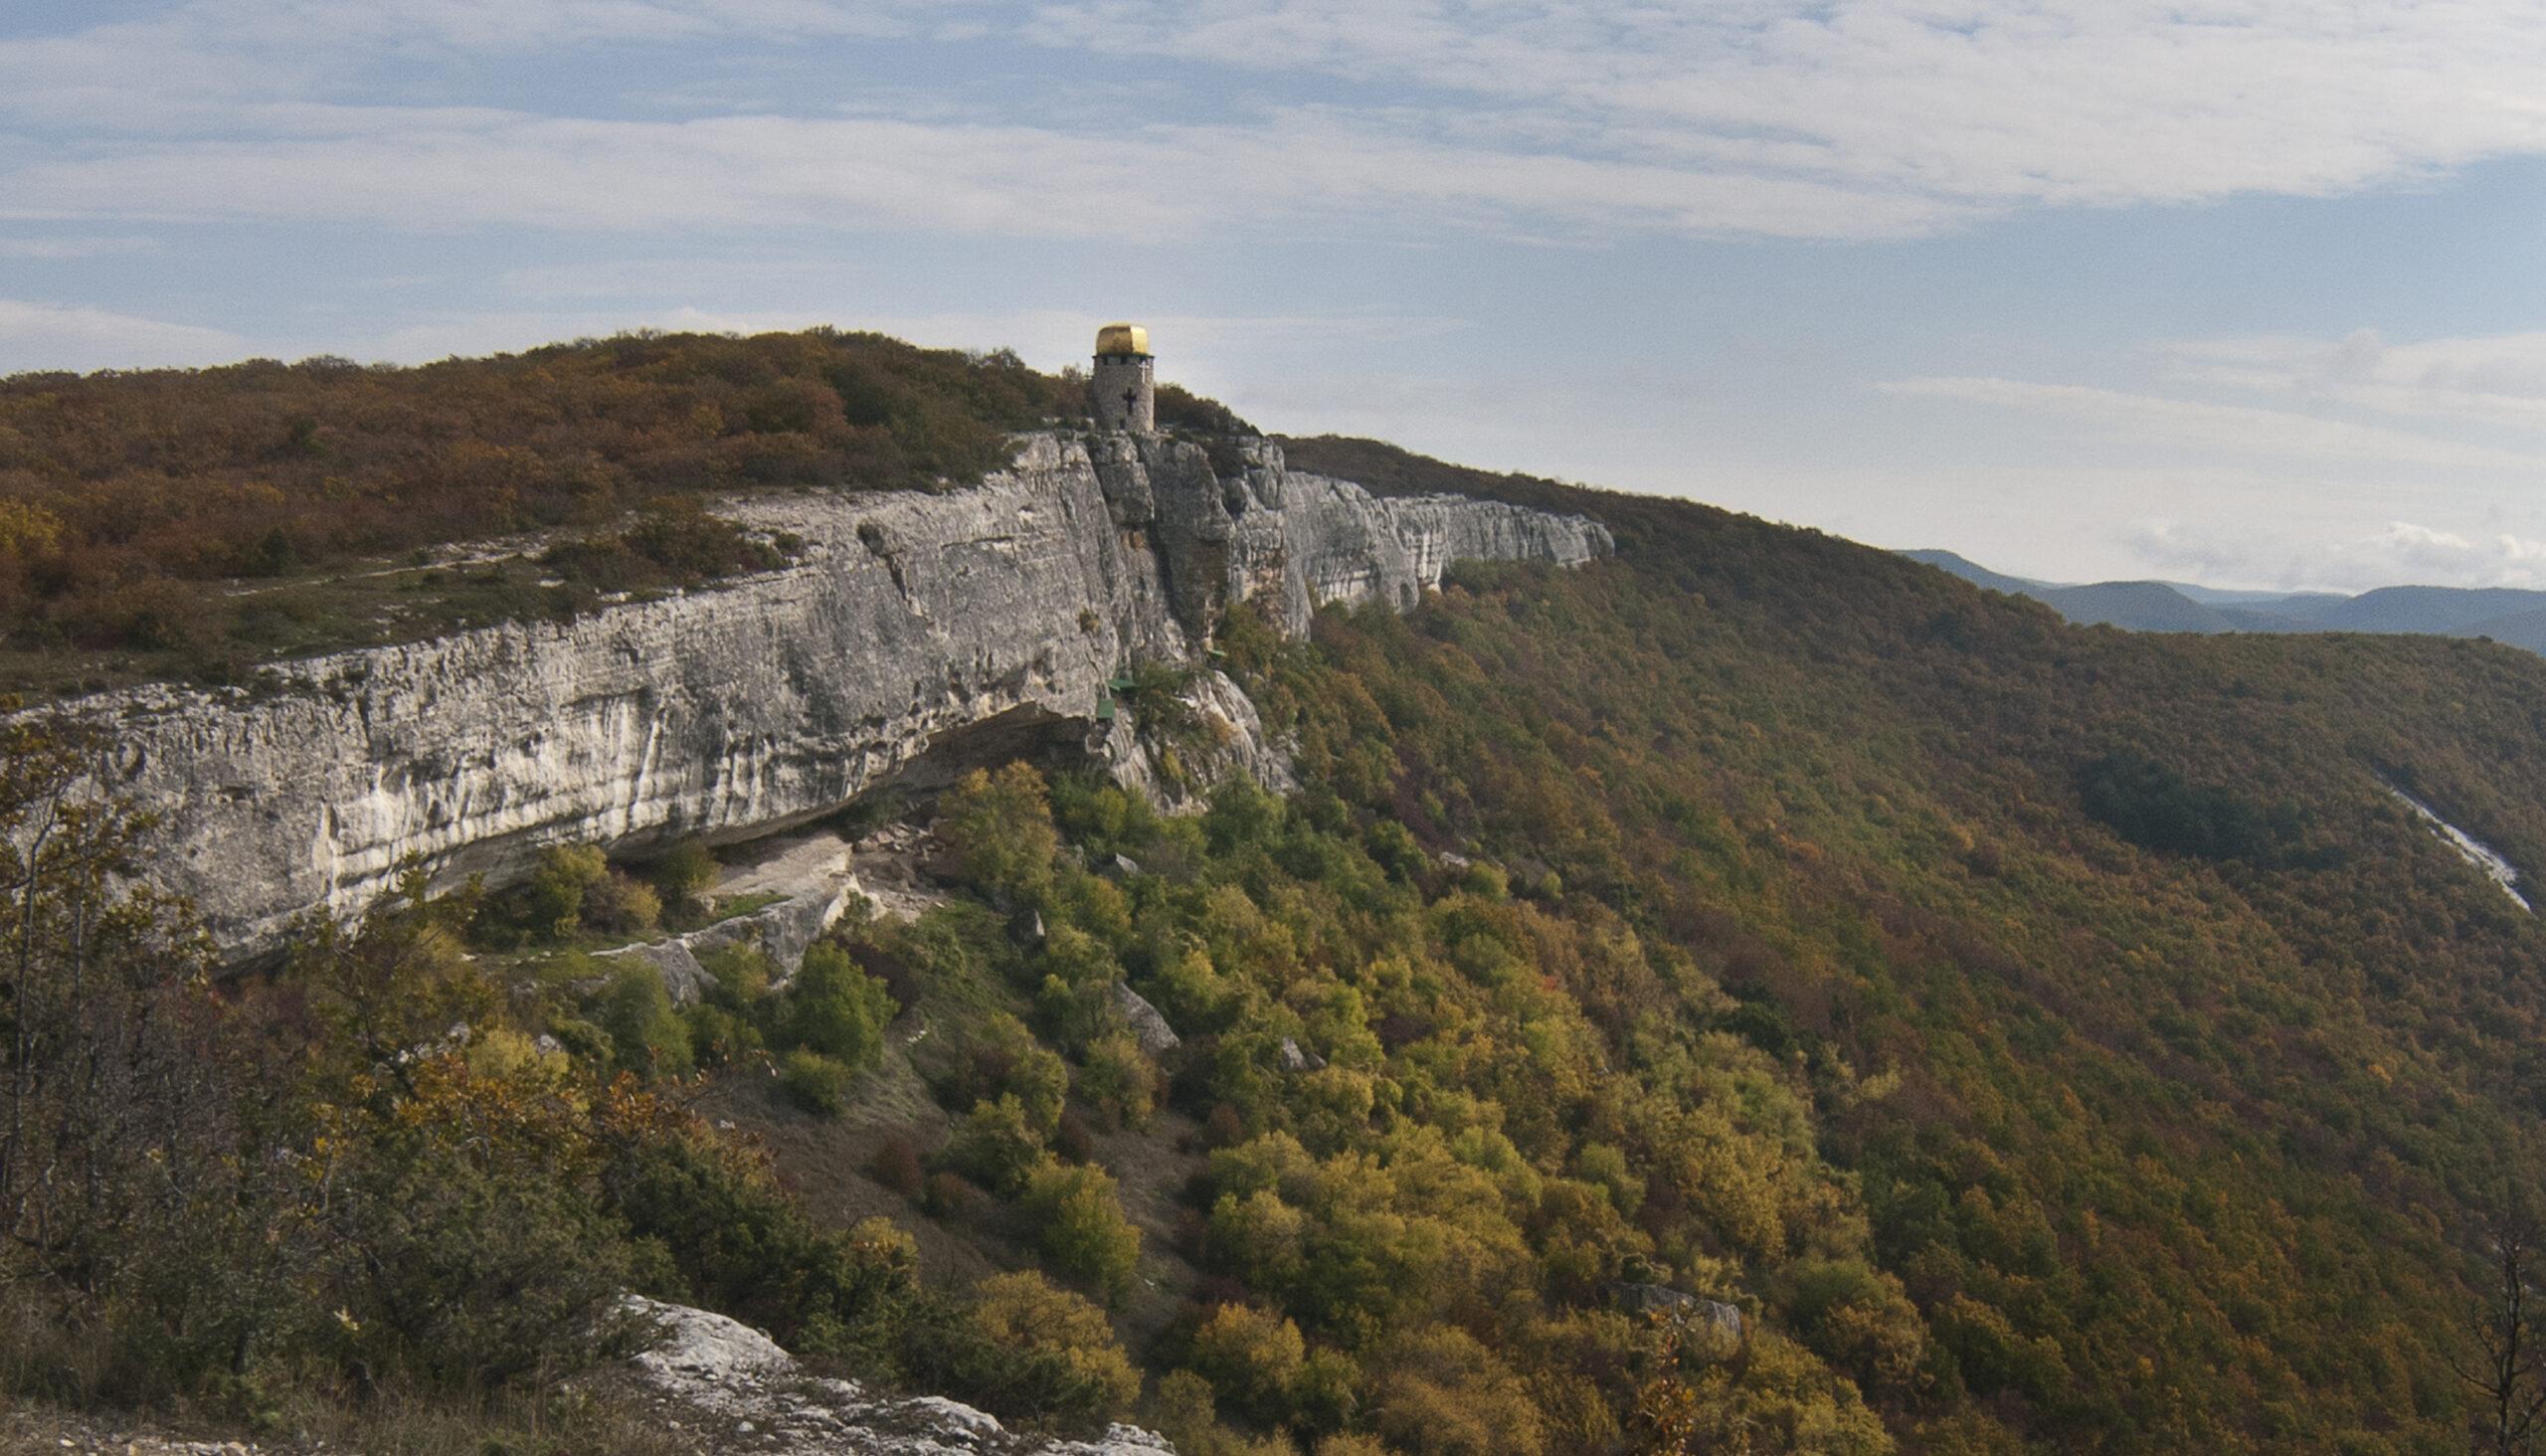 Шулдан: монастир у скелі